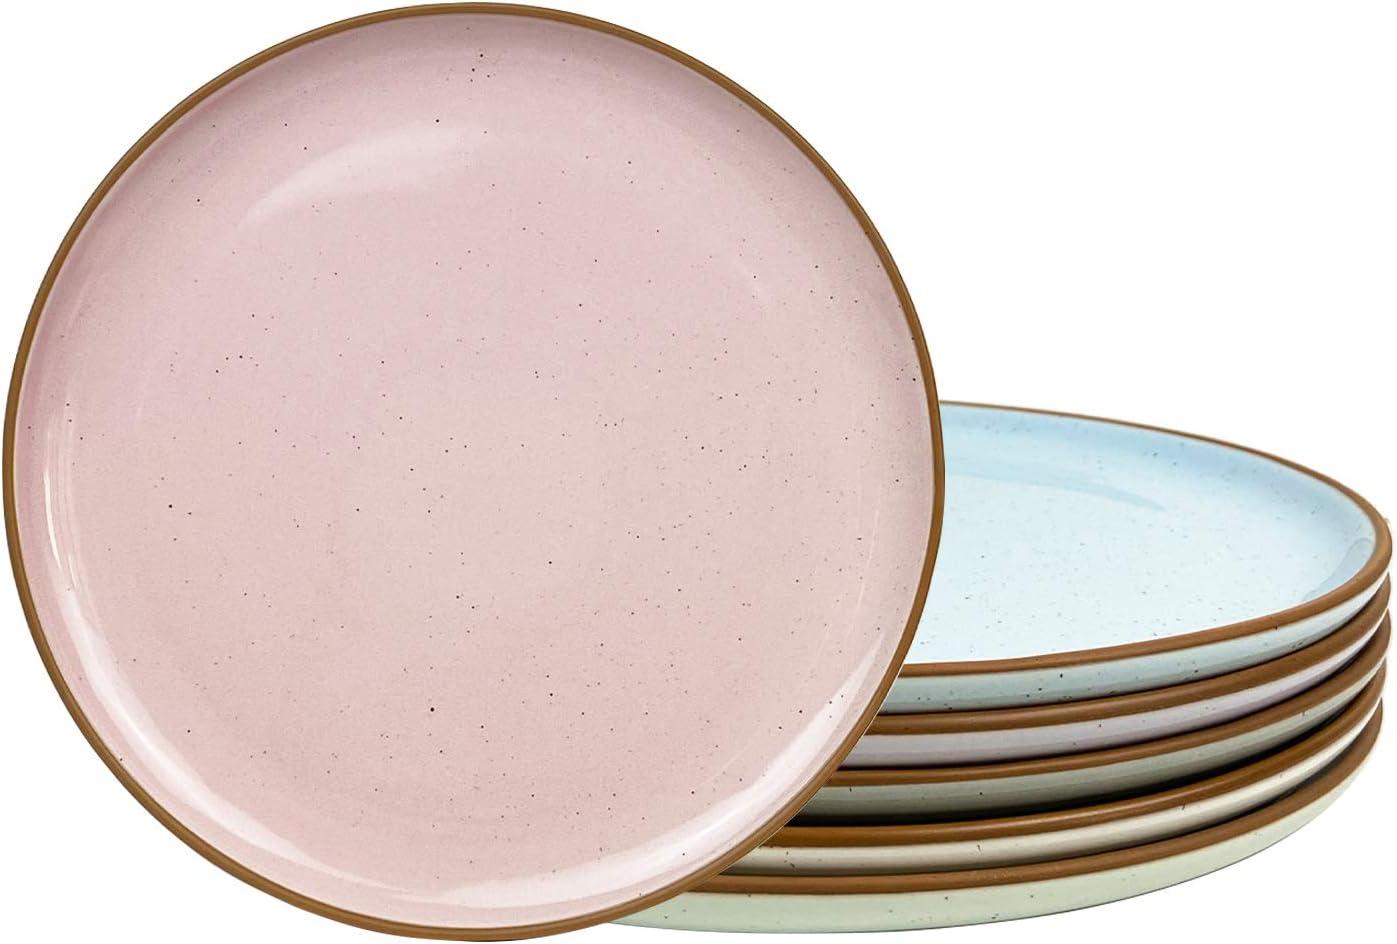 Mora Ceramic Dinner Plates Set of 6, 10 inch Dish Set - Microwave, Oven, and Dishwasher Safe, Scratch Resistant, Modern Rustic Dinnerware- Kitchen Porcelain Serving Dishes - Assorted Colors